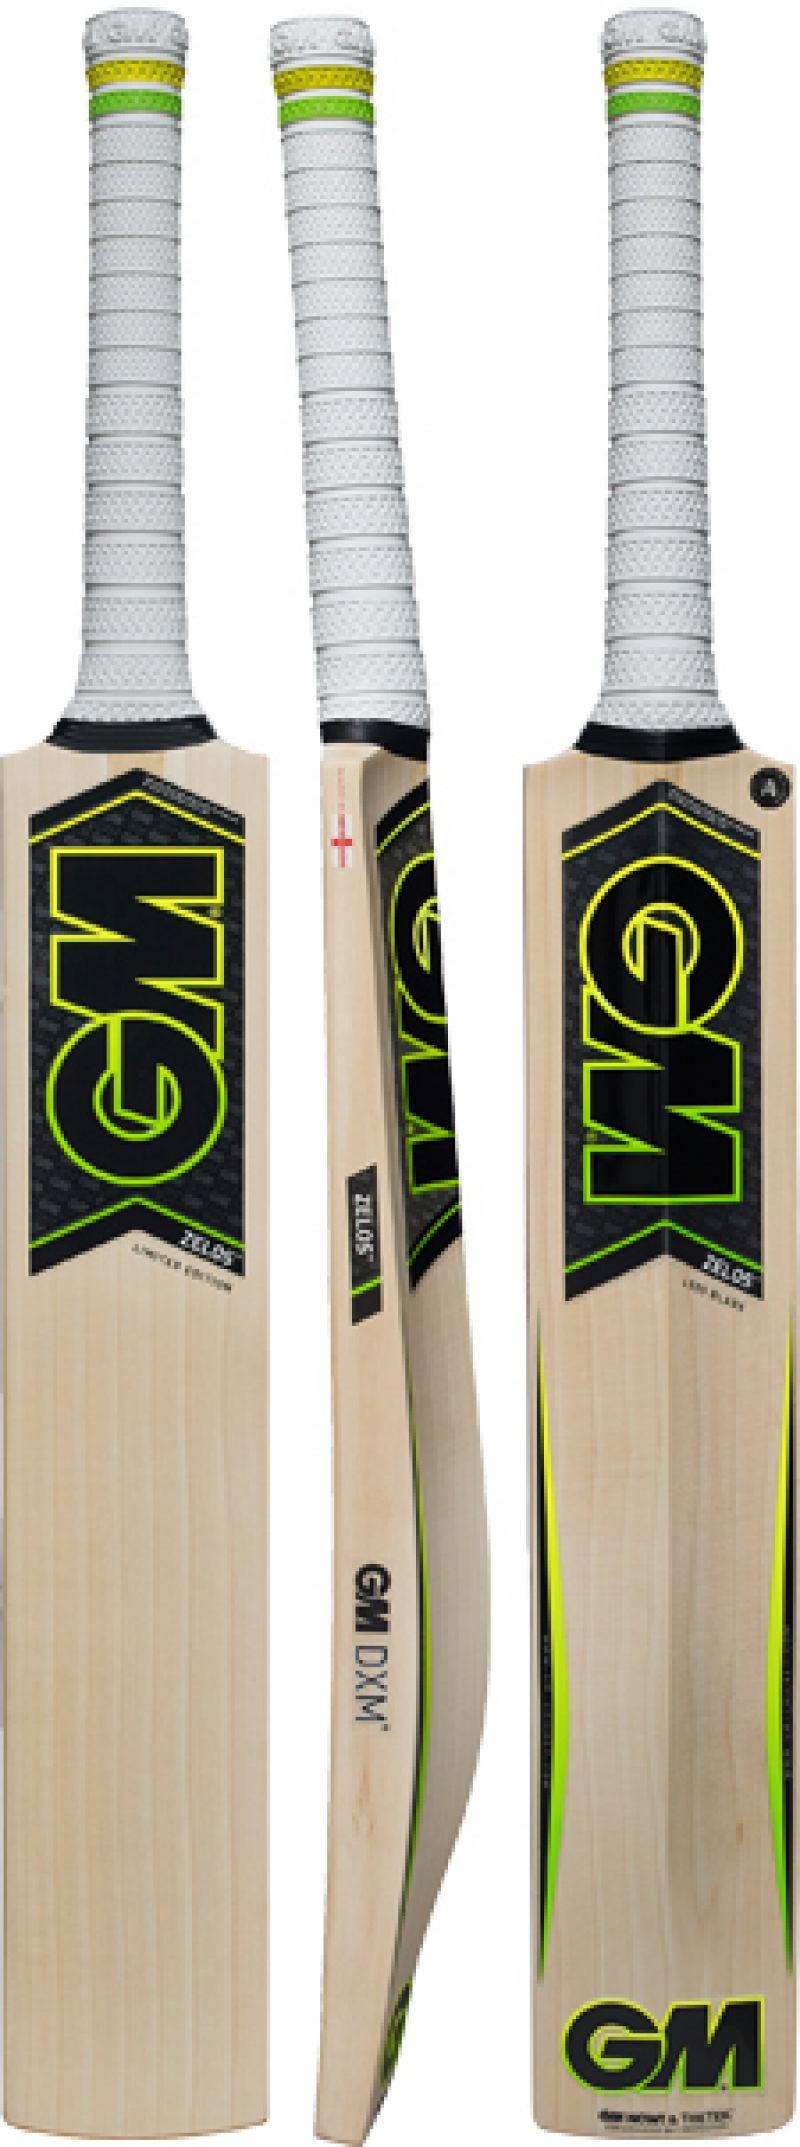 Gunn and Moore Zelos L555 DXM 606 GM NOW Cricket Bat